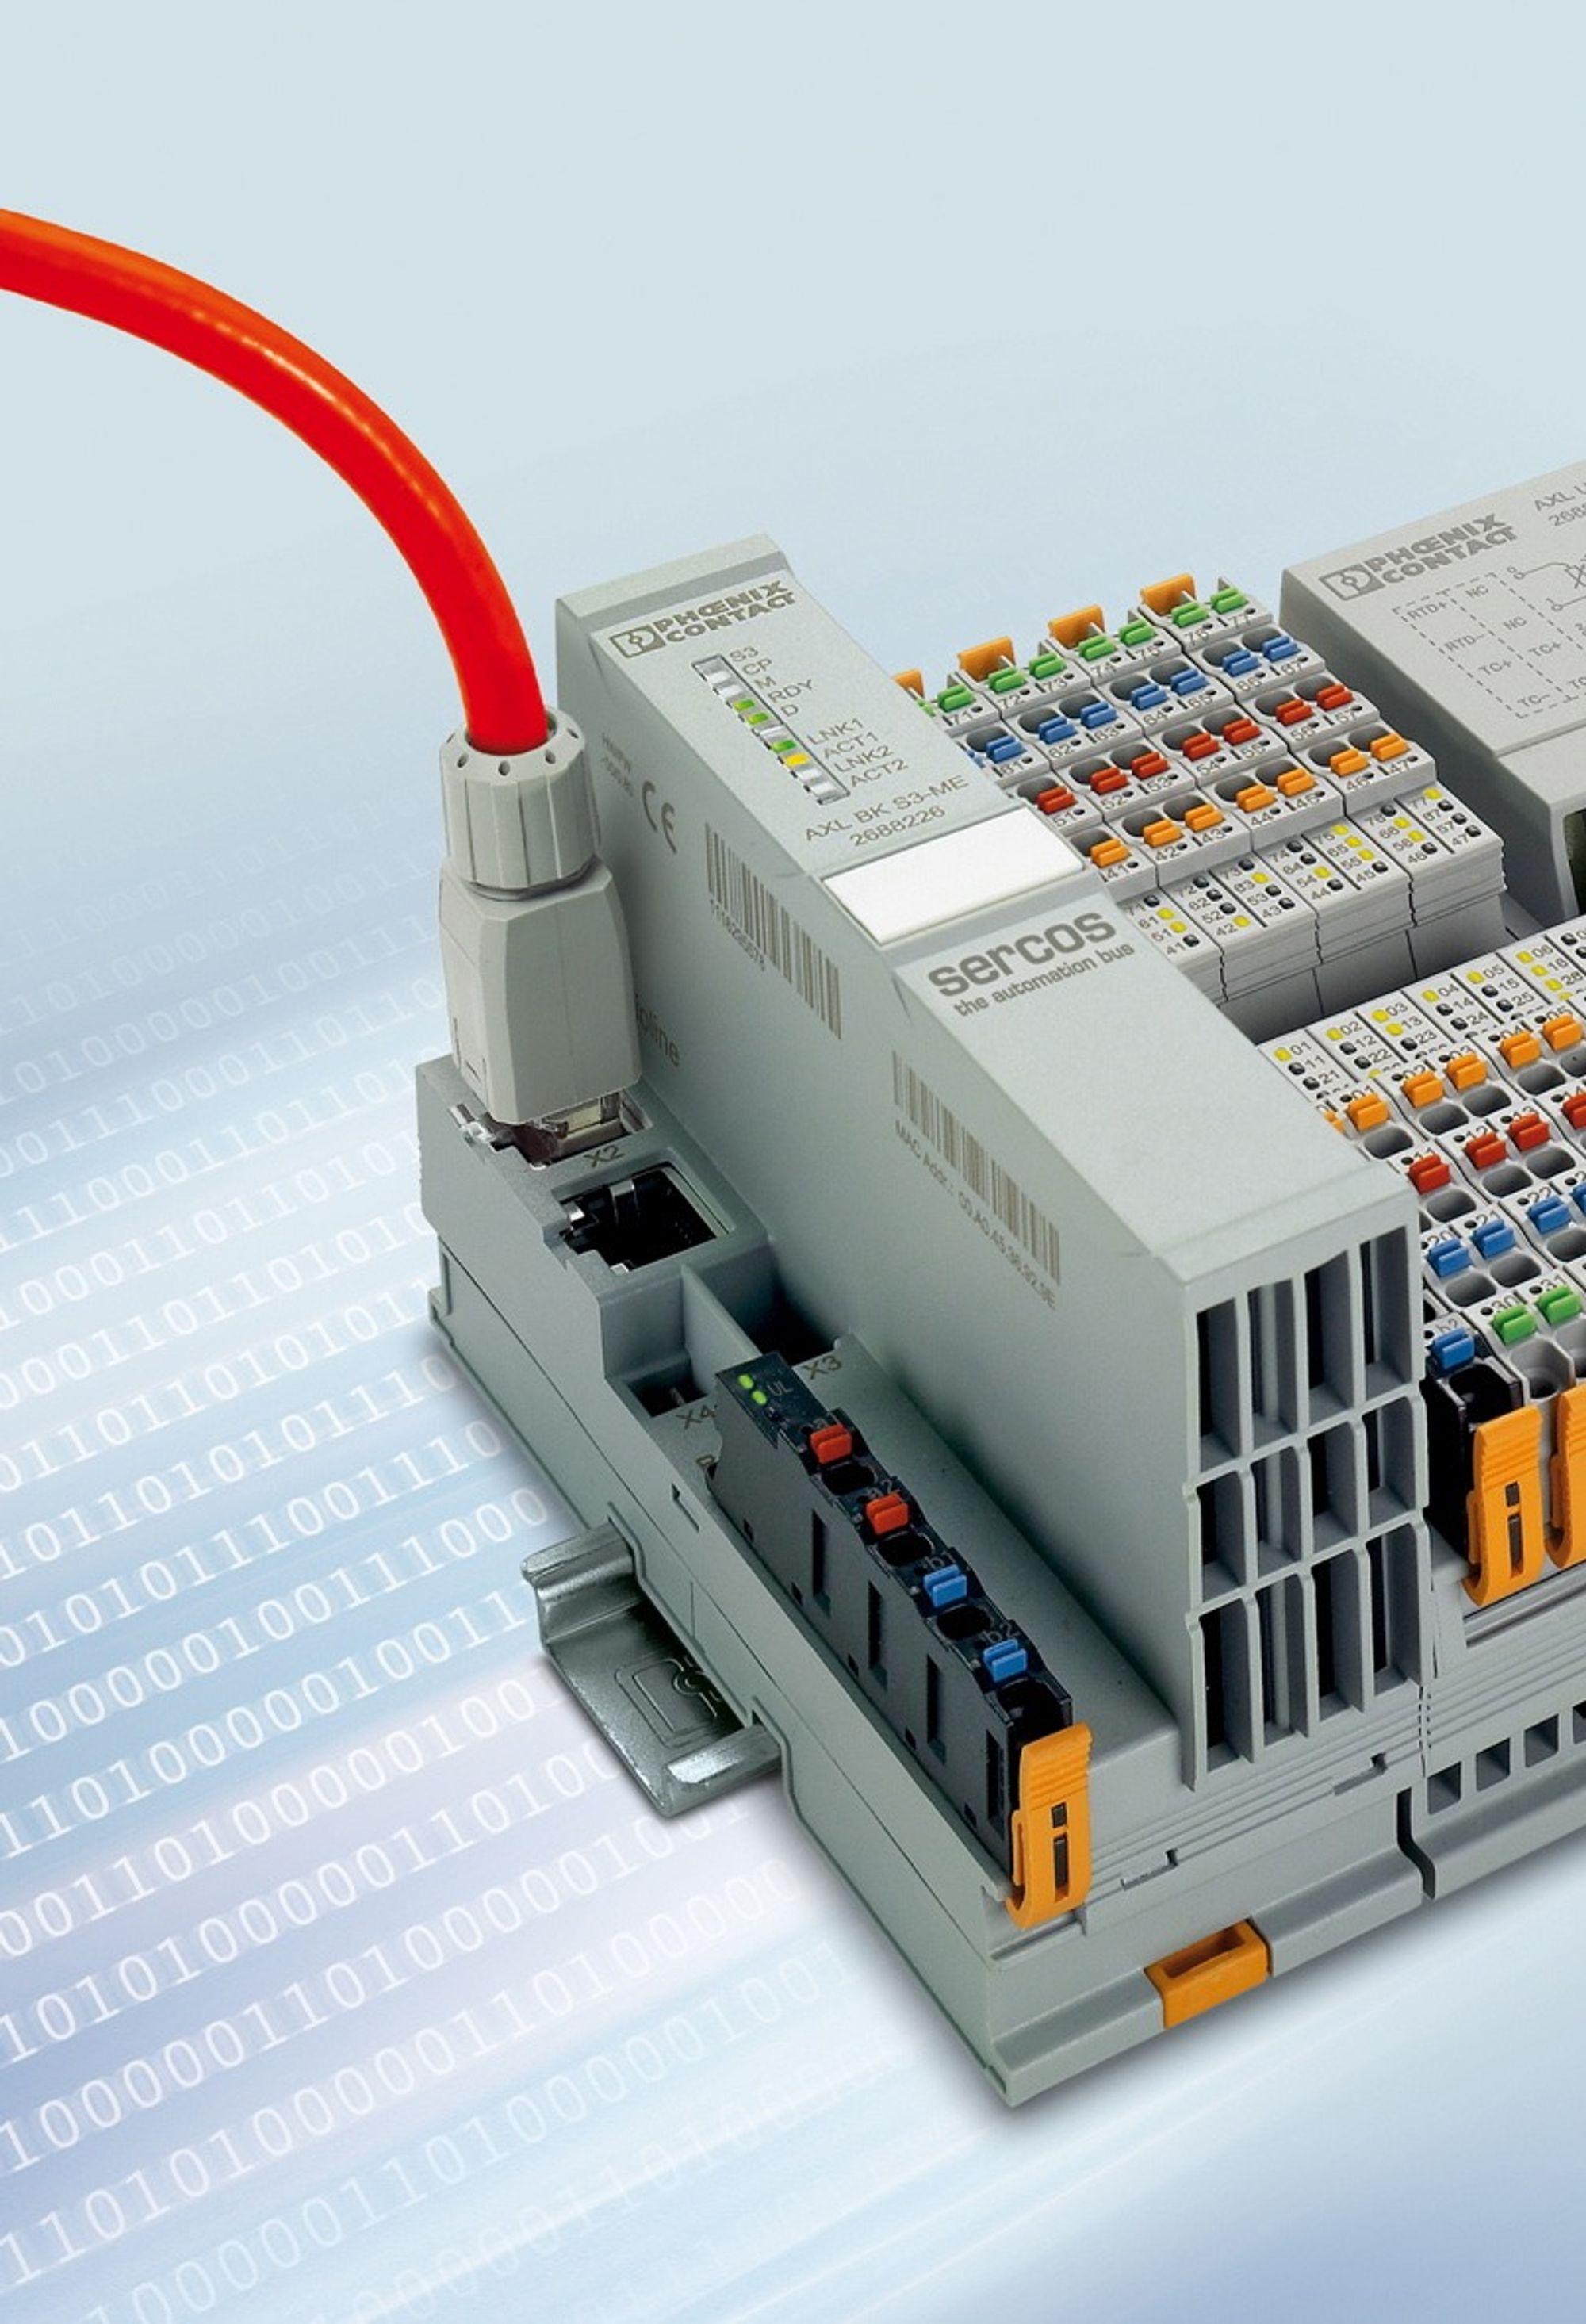 Sercos-busskopler som skyfler data kjapt og synkront for drives og andre I/O-moduler.